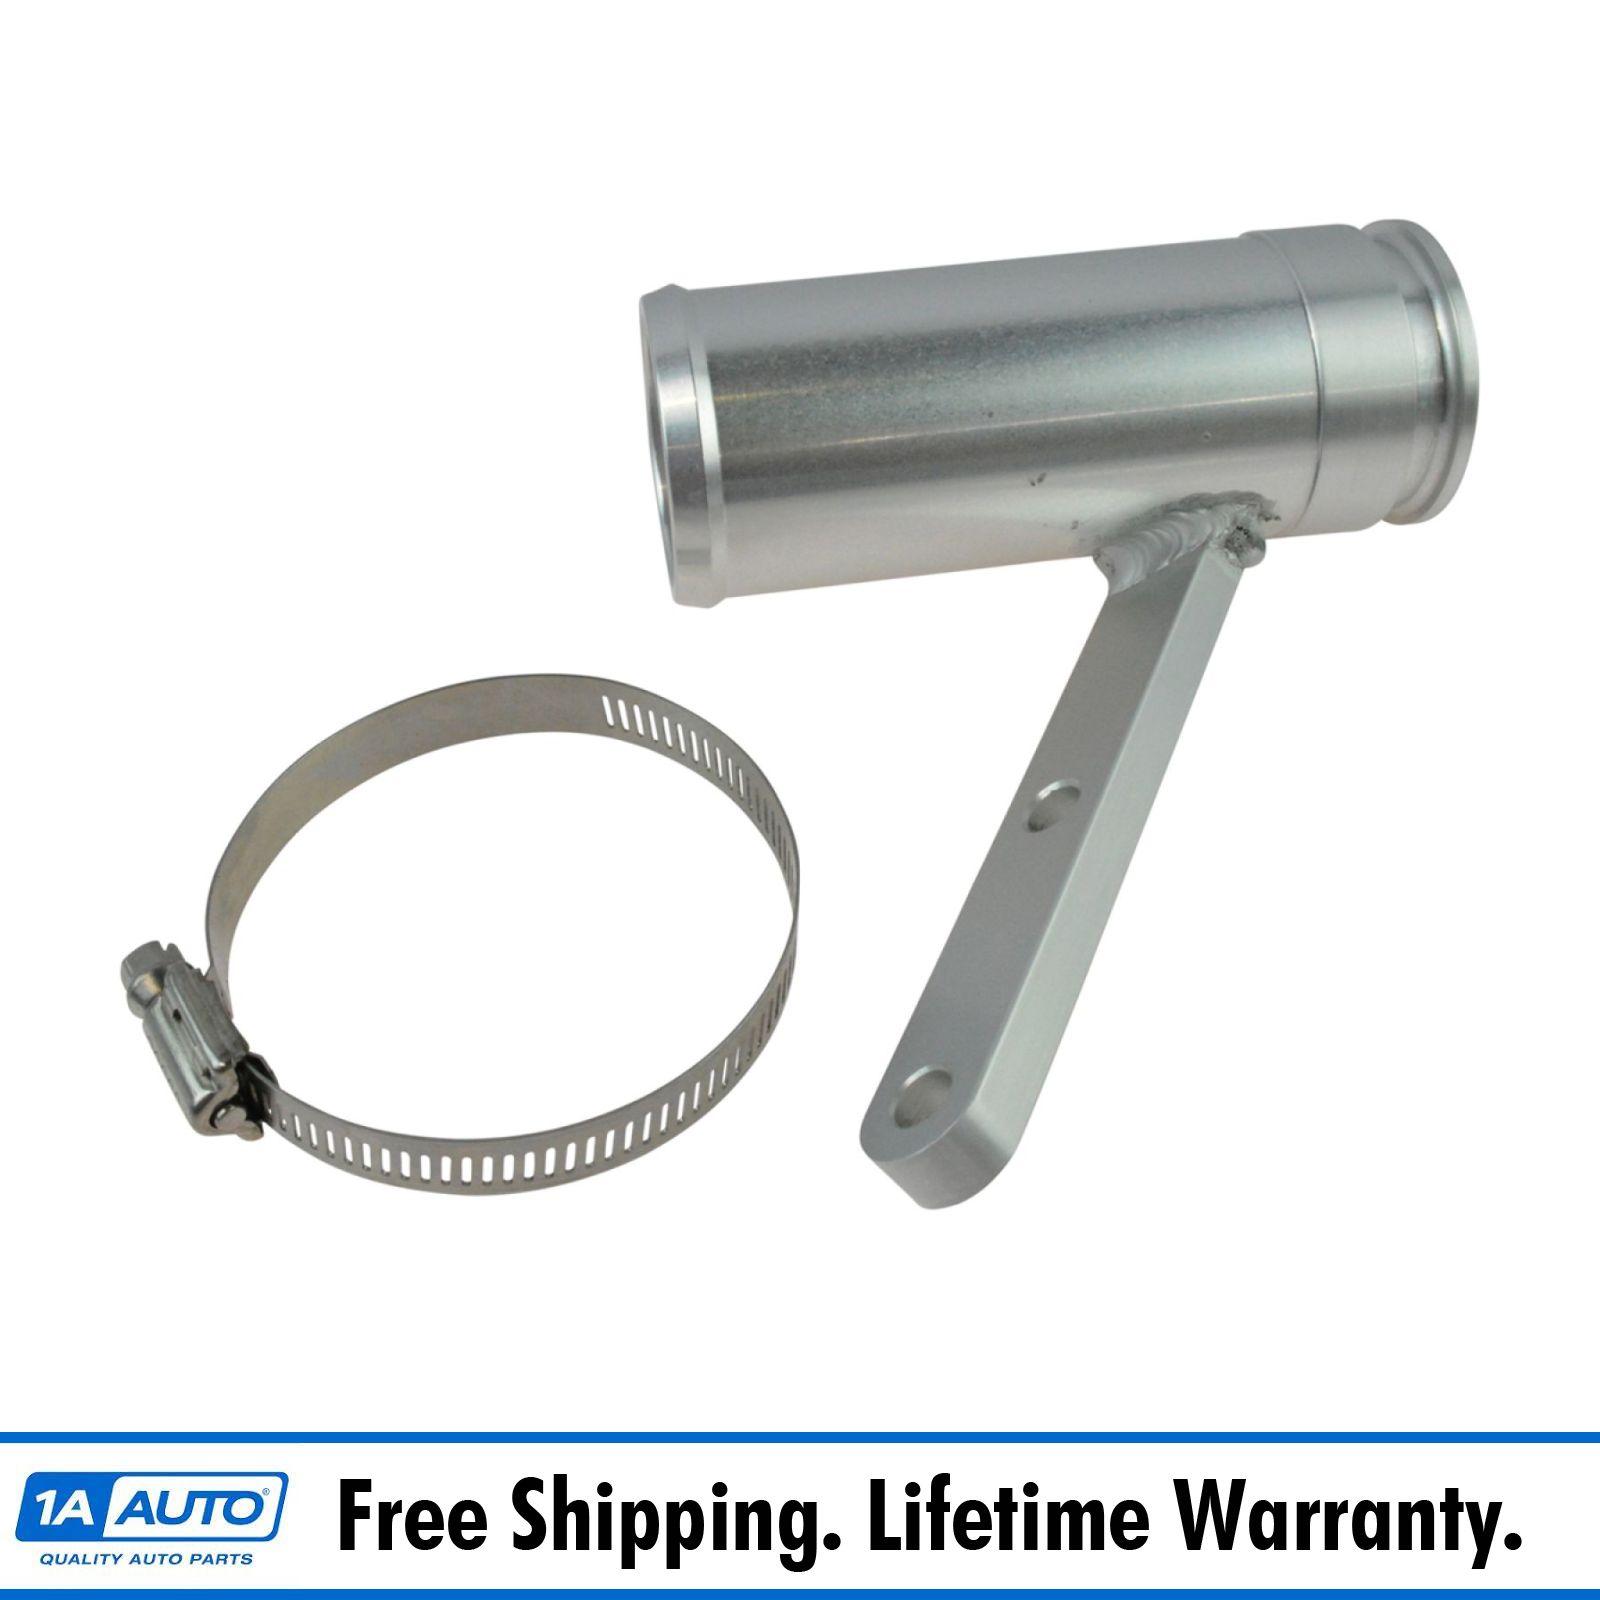 4-3//4-Inch Ancra 49716-10 Portawinch Stake Pocket Outward Off-Set